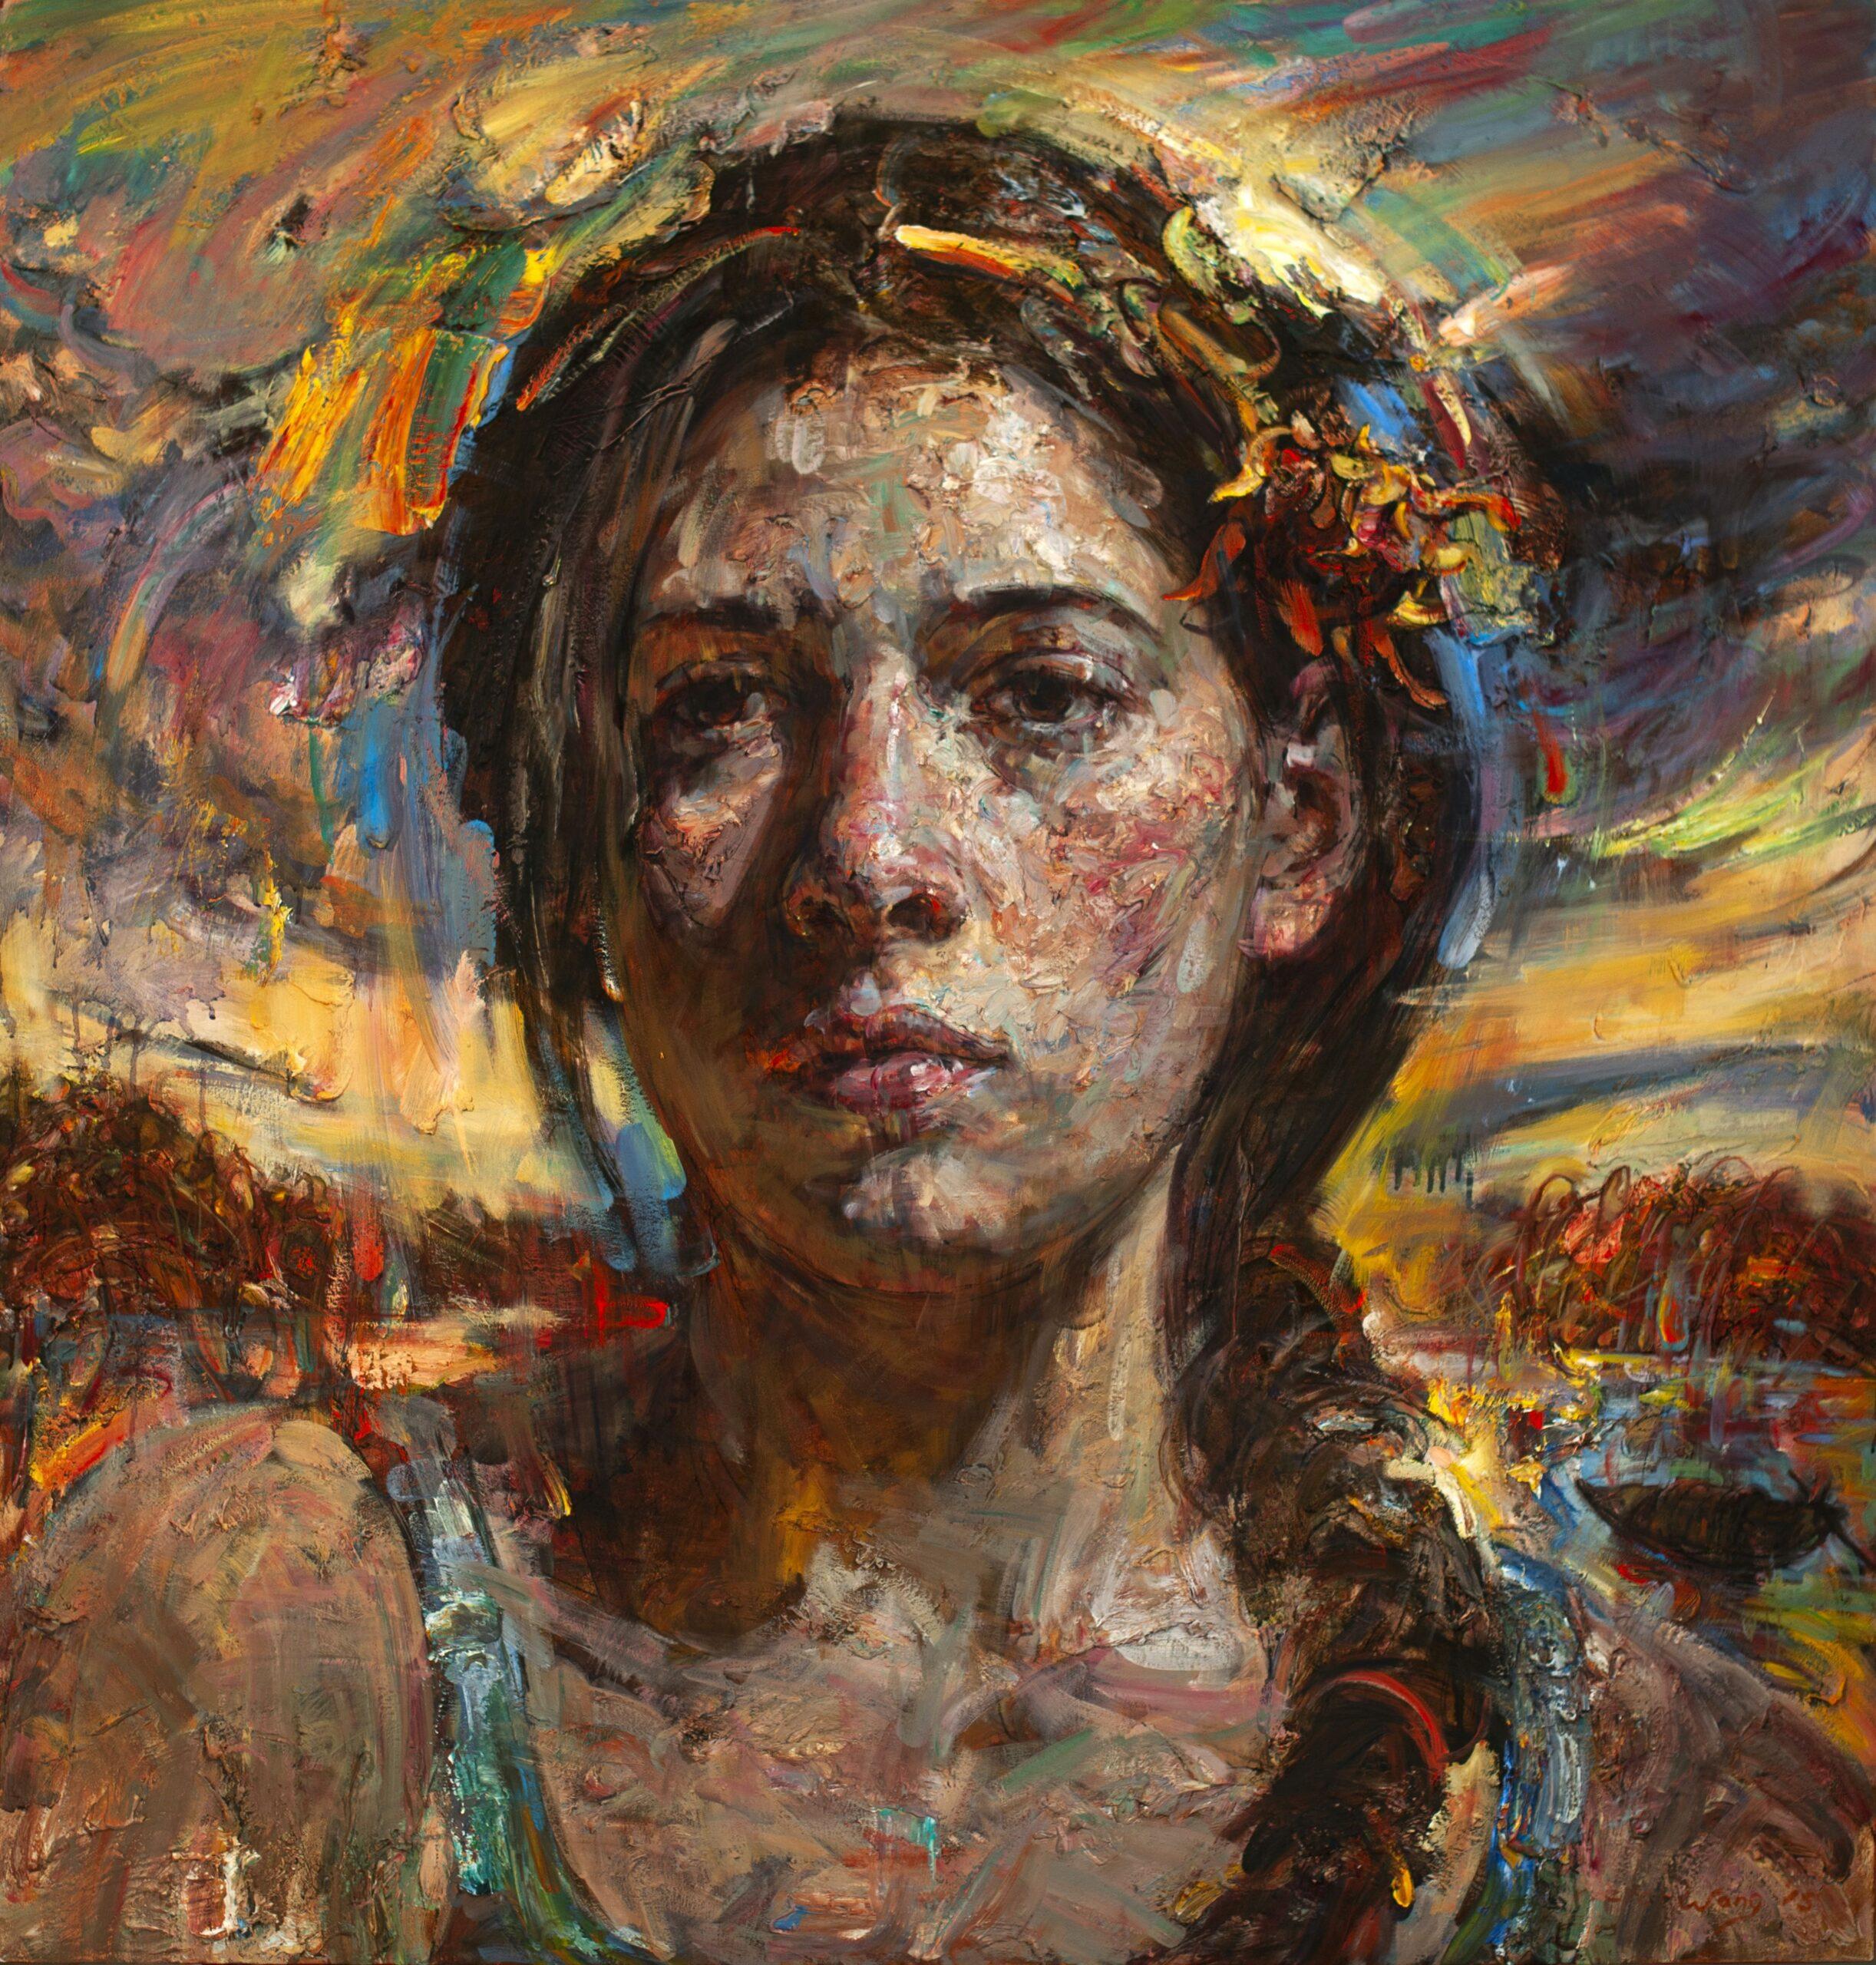 painted impressionist portrait of woman